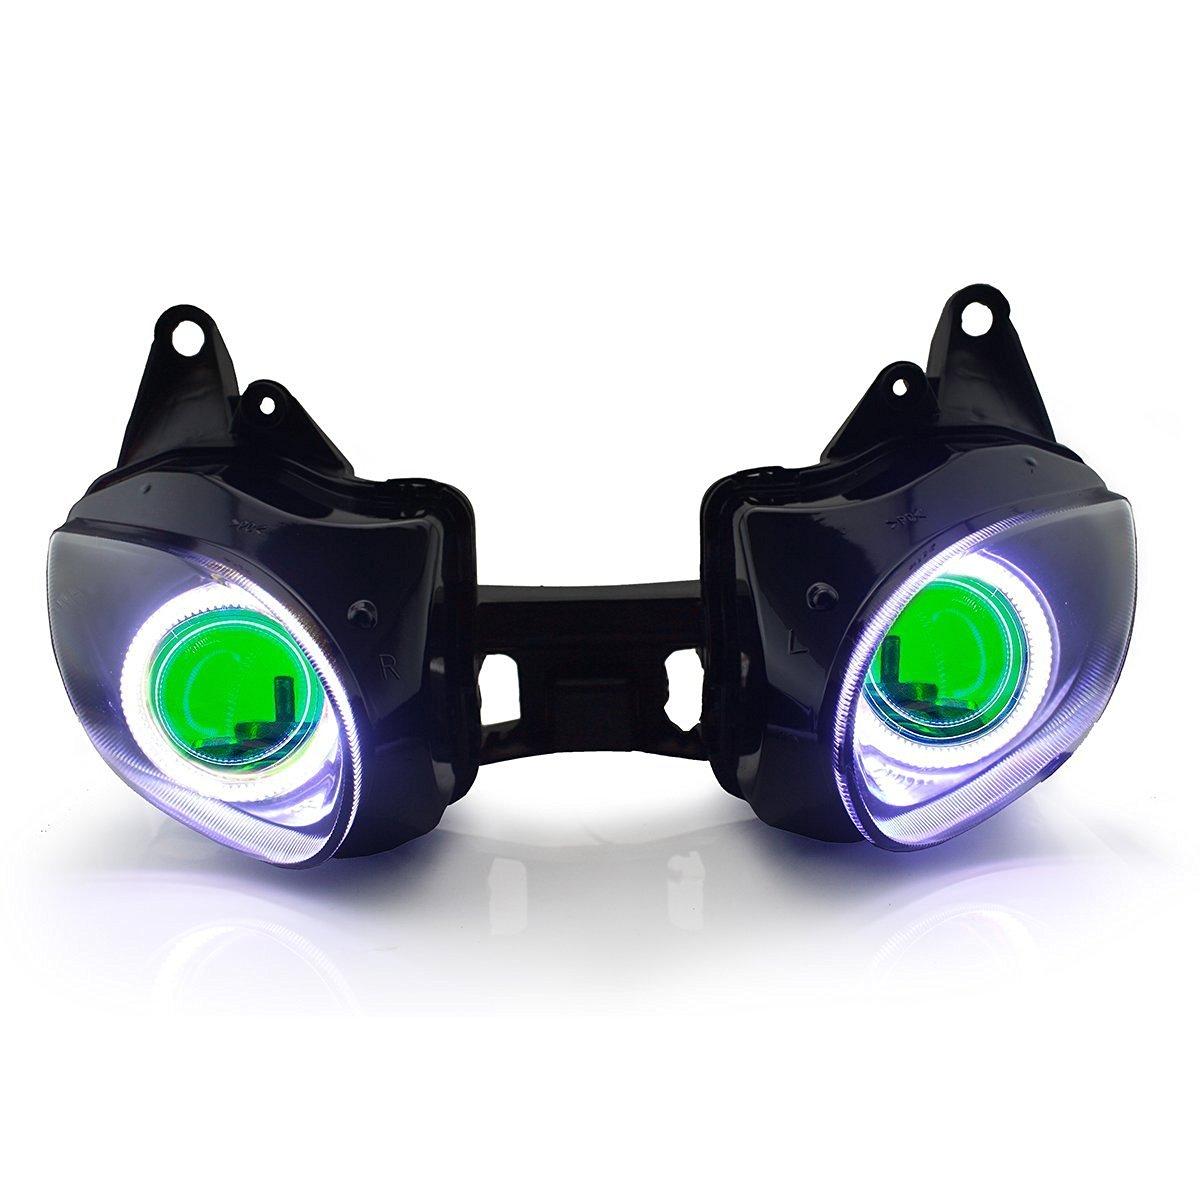 KT LED Angel Eye Headlight Assembly for Kawasaki Ninja ZX-6R 2007-2008 Green Demon Eye